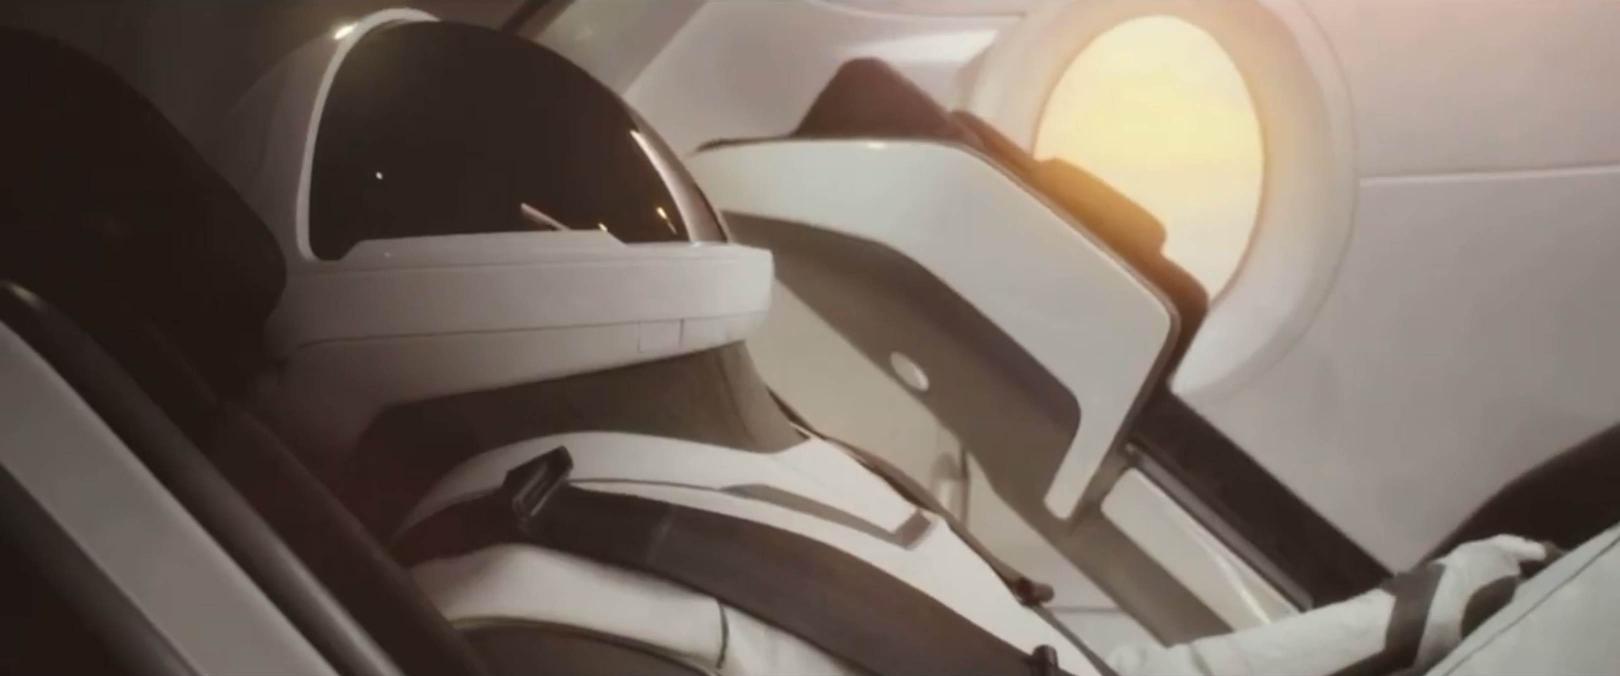 Crew Dragon DM-1 Ripley (SpaceX) 7